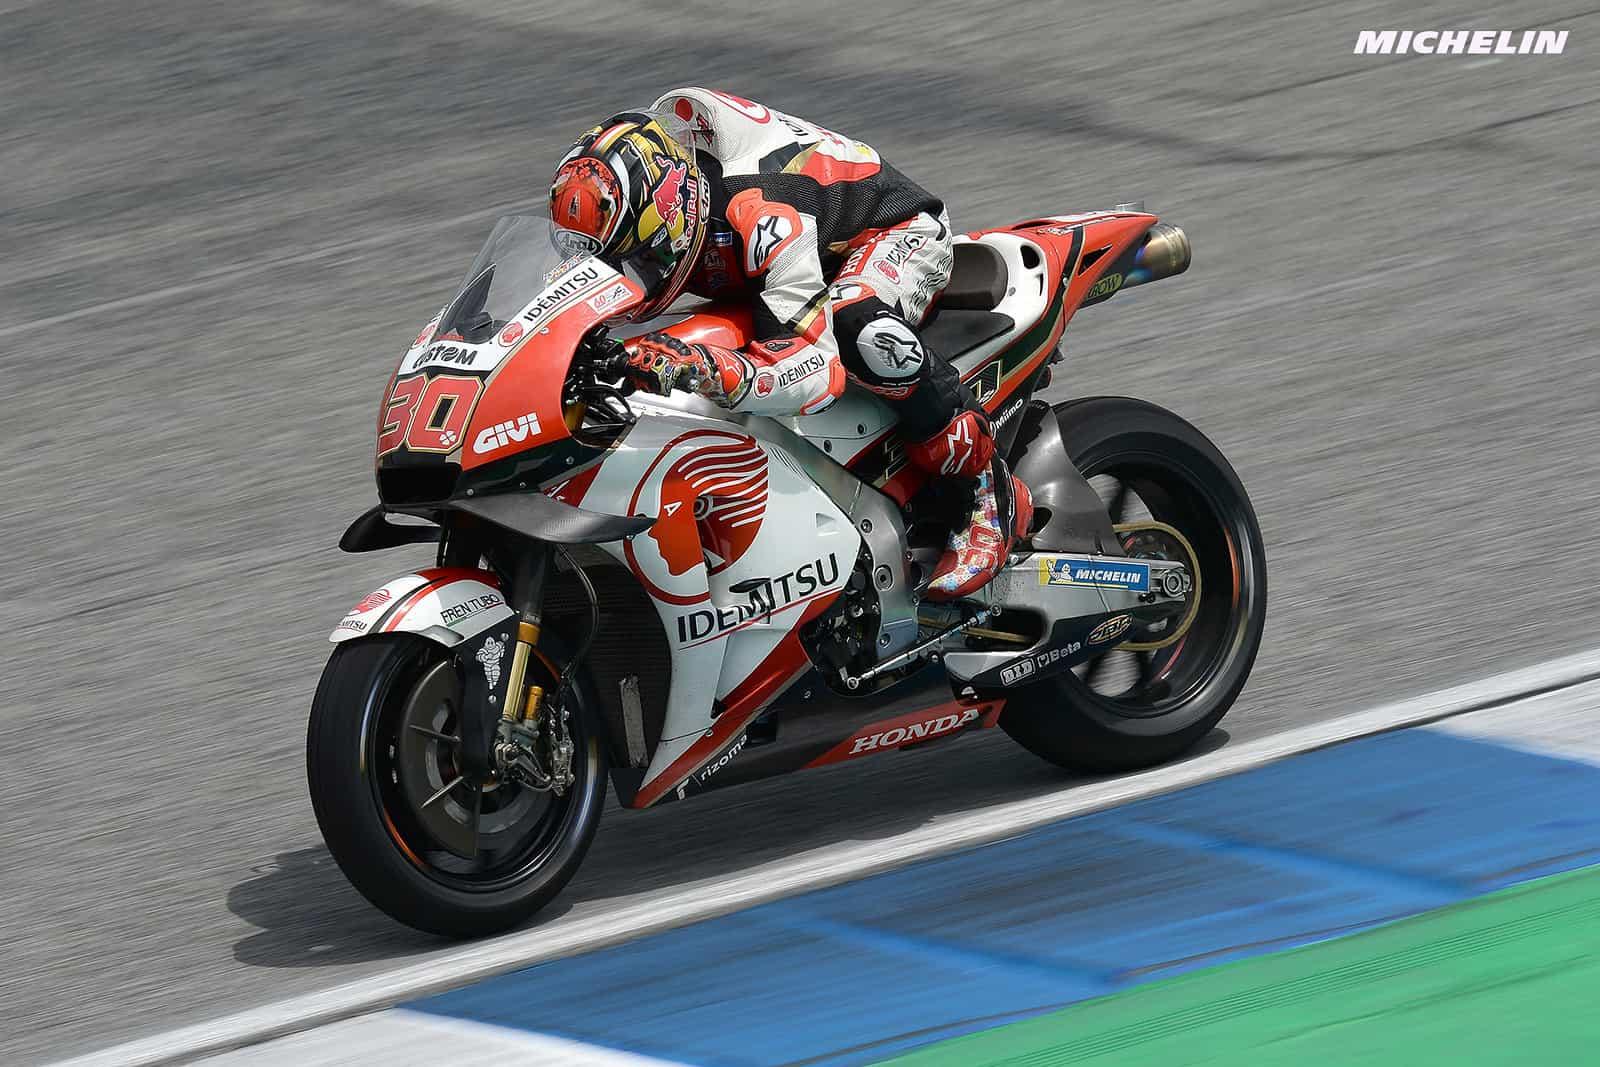 MotoGP2019タイGP 10位中上「トップ10獲得出来たことが嬉しい」